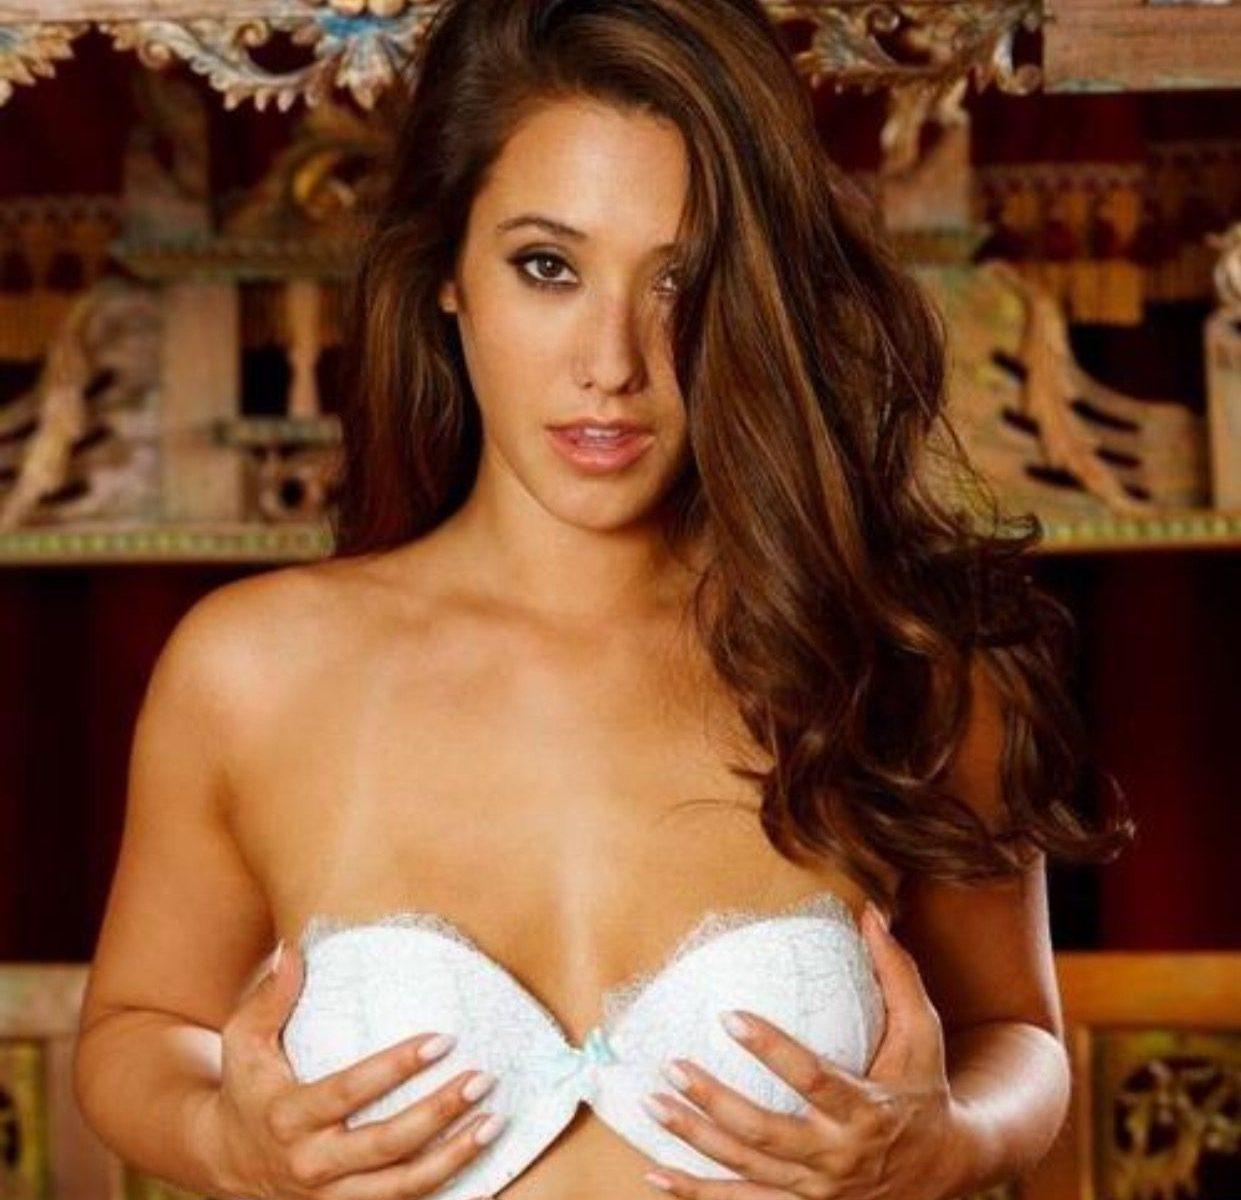 Eva Lovia Porn Star Photo